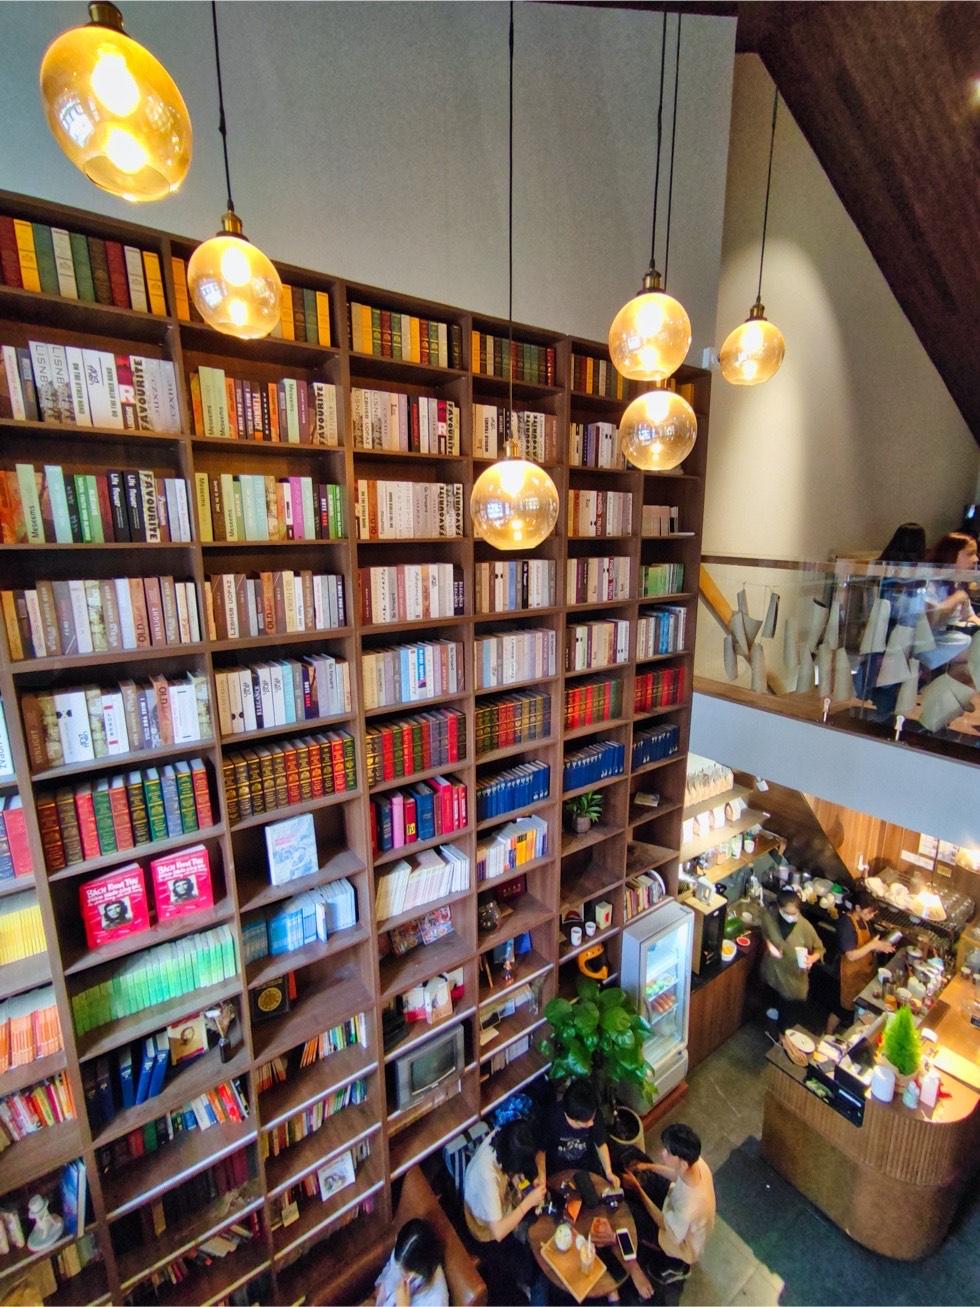 BAN Ca Phe Bookshelf